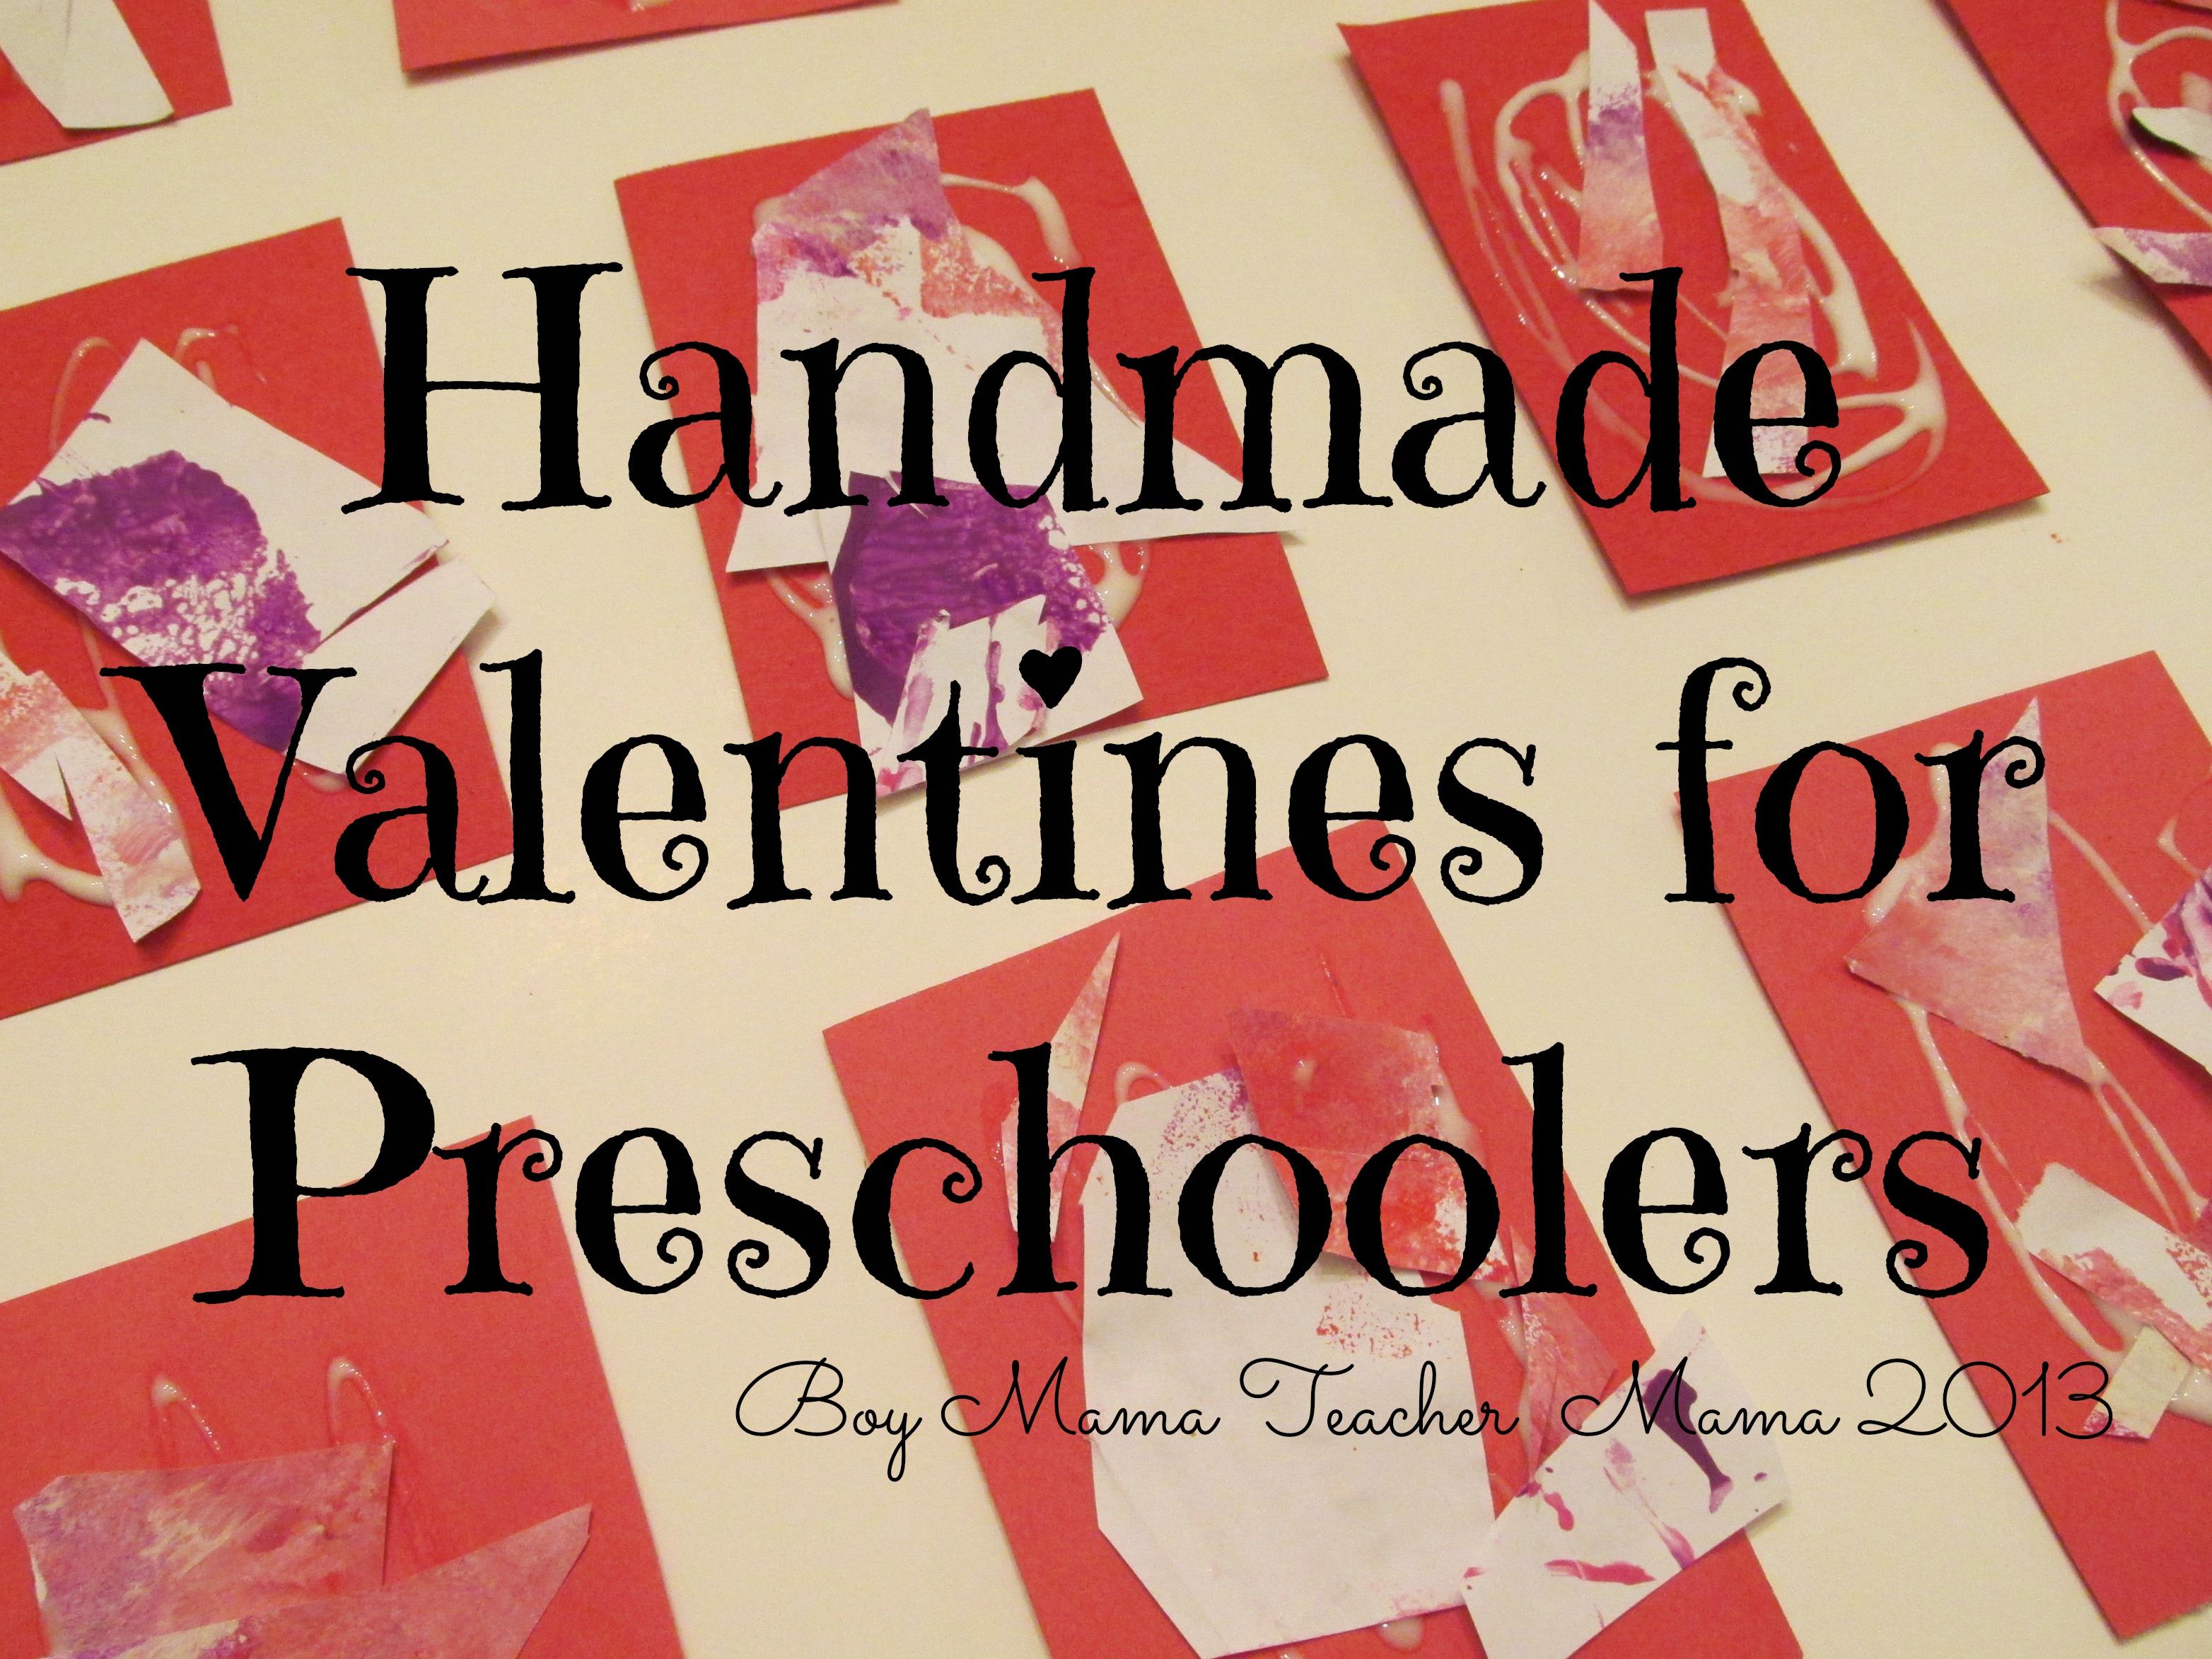 Boy Mama Handmade Valentines For Preschoolers